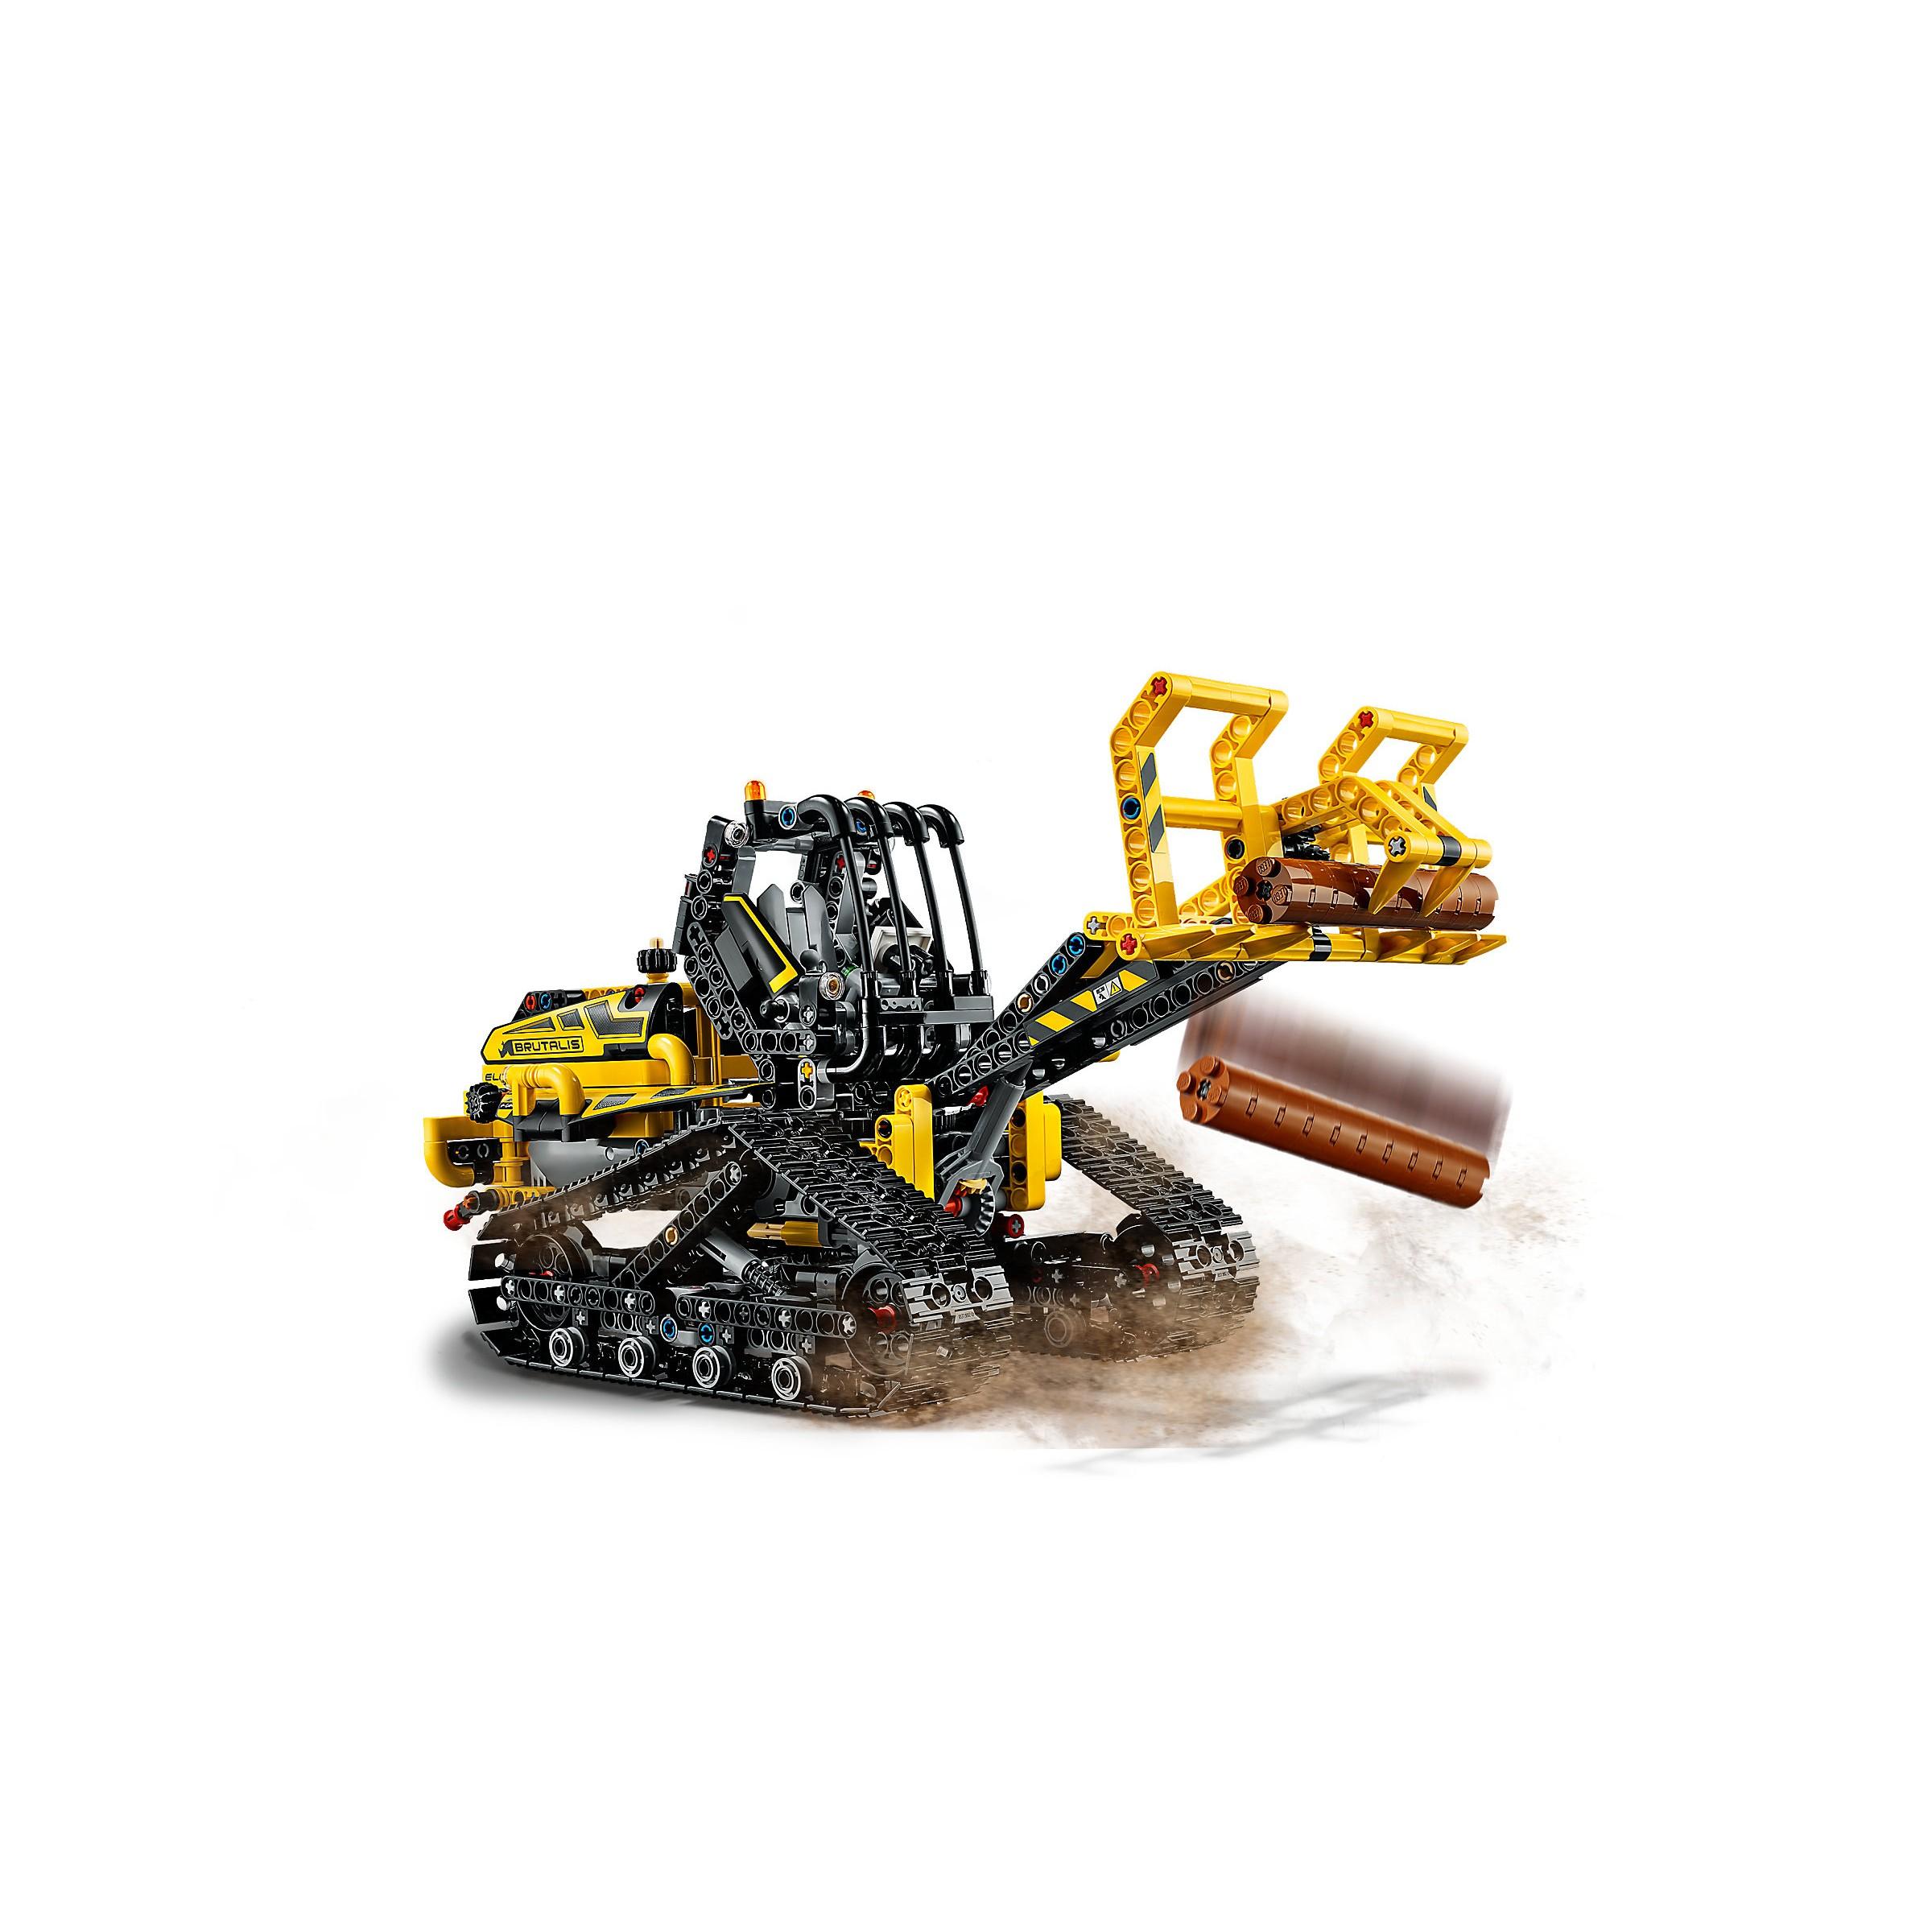 LEGO 42094 Technic Tracked Loader